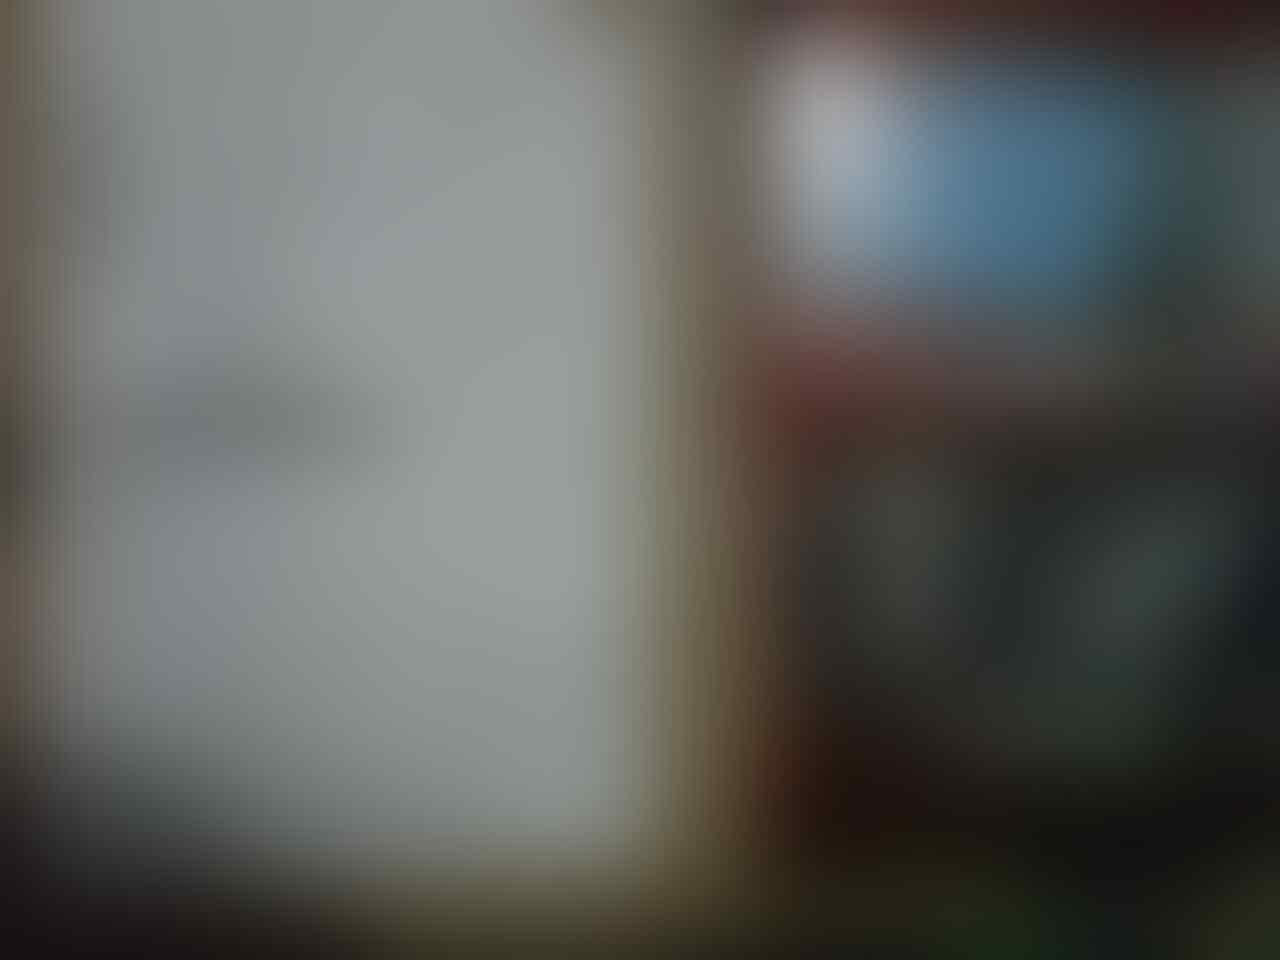 Jasa Order Pembelian Aliexpress Gearbest Hobbyking Dhgate dan Forwarder China